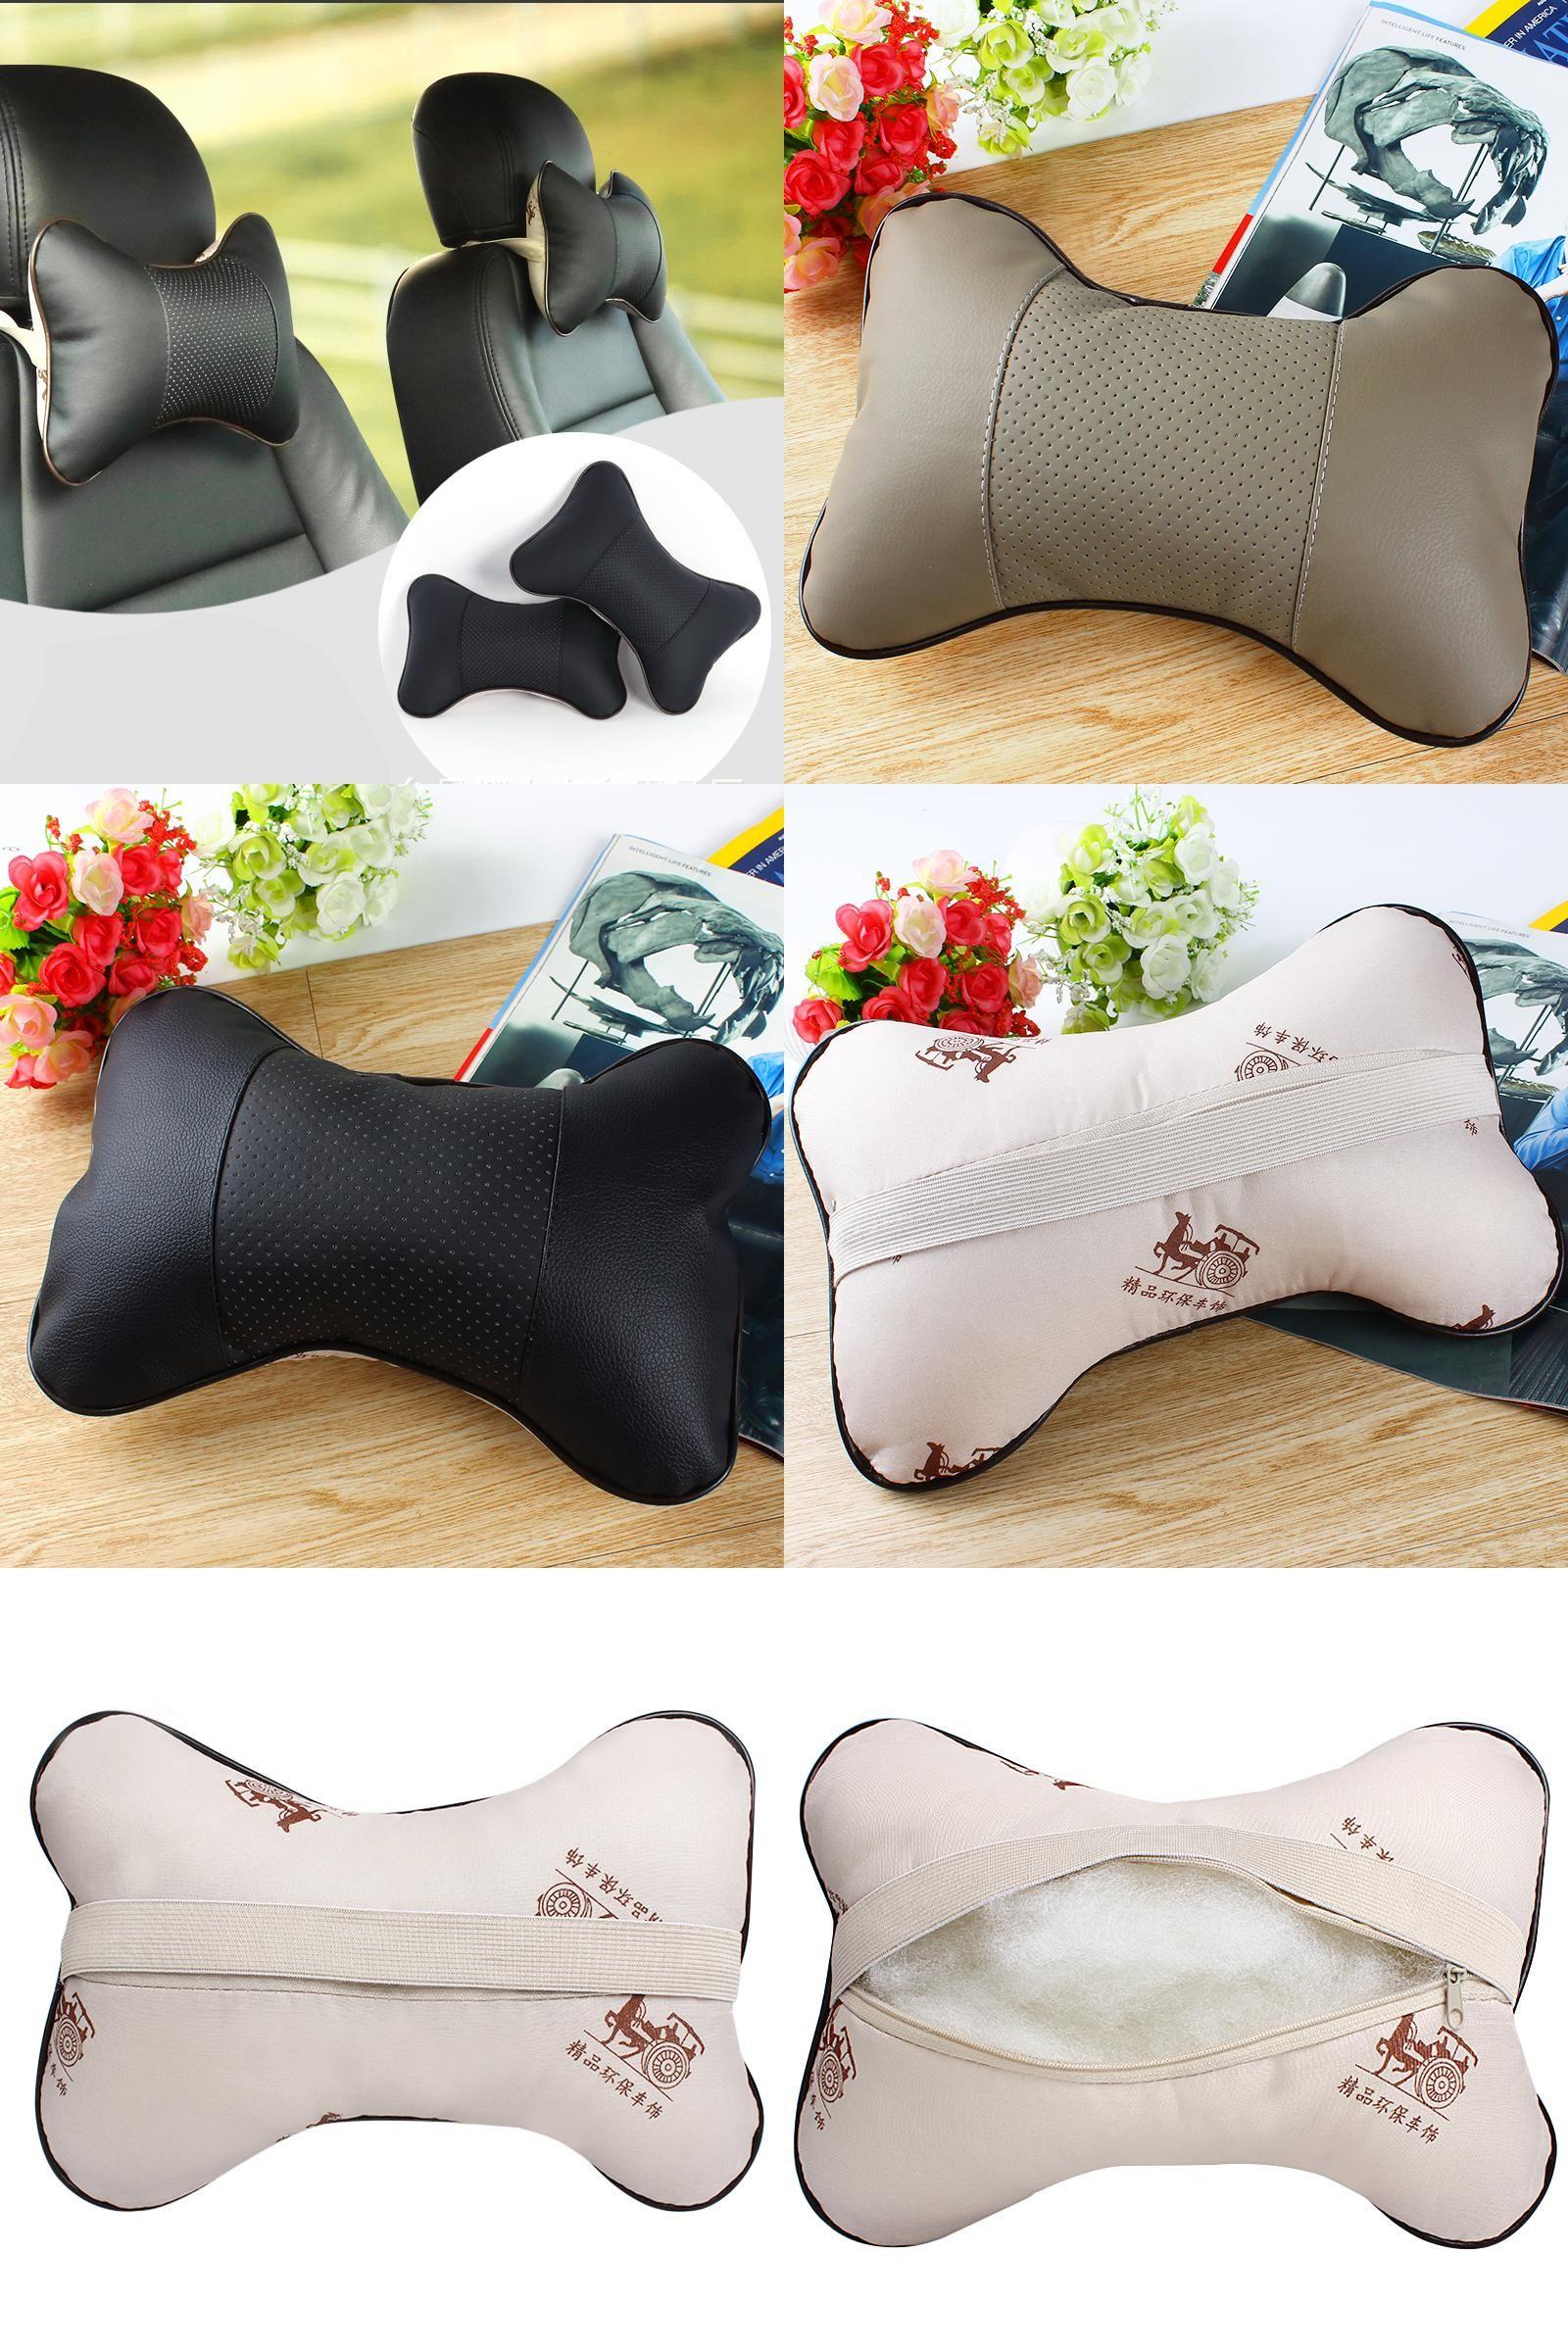 Visit to buy pcs pu leather car headrest neck pillow auto seat